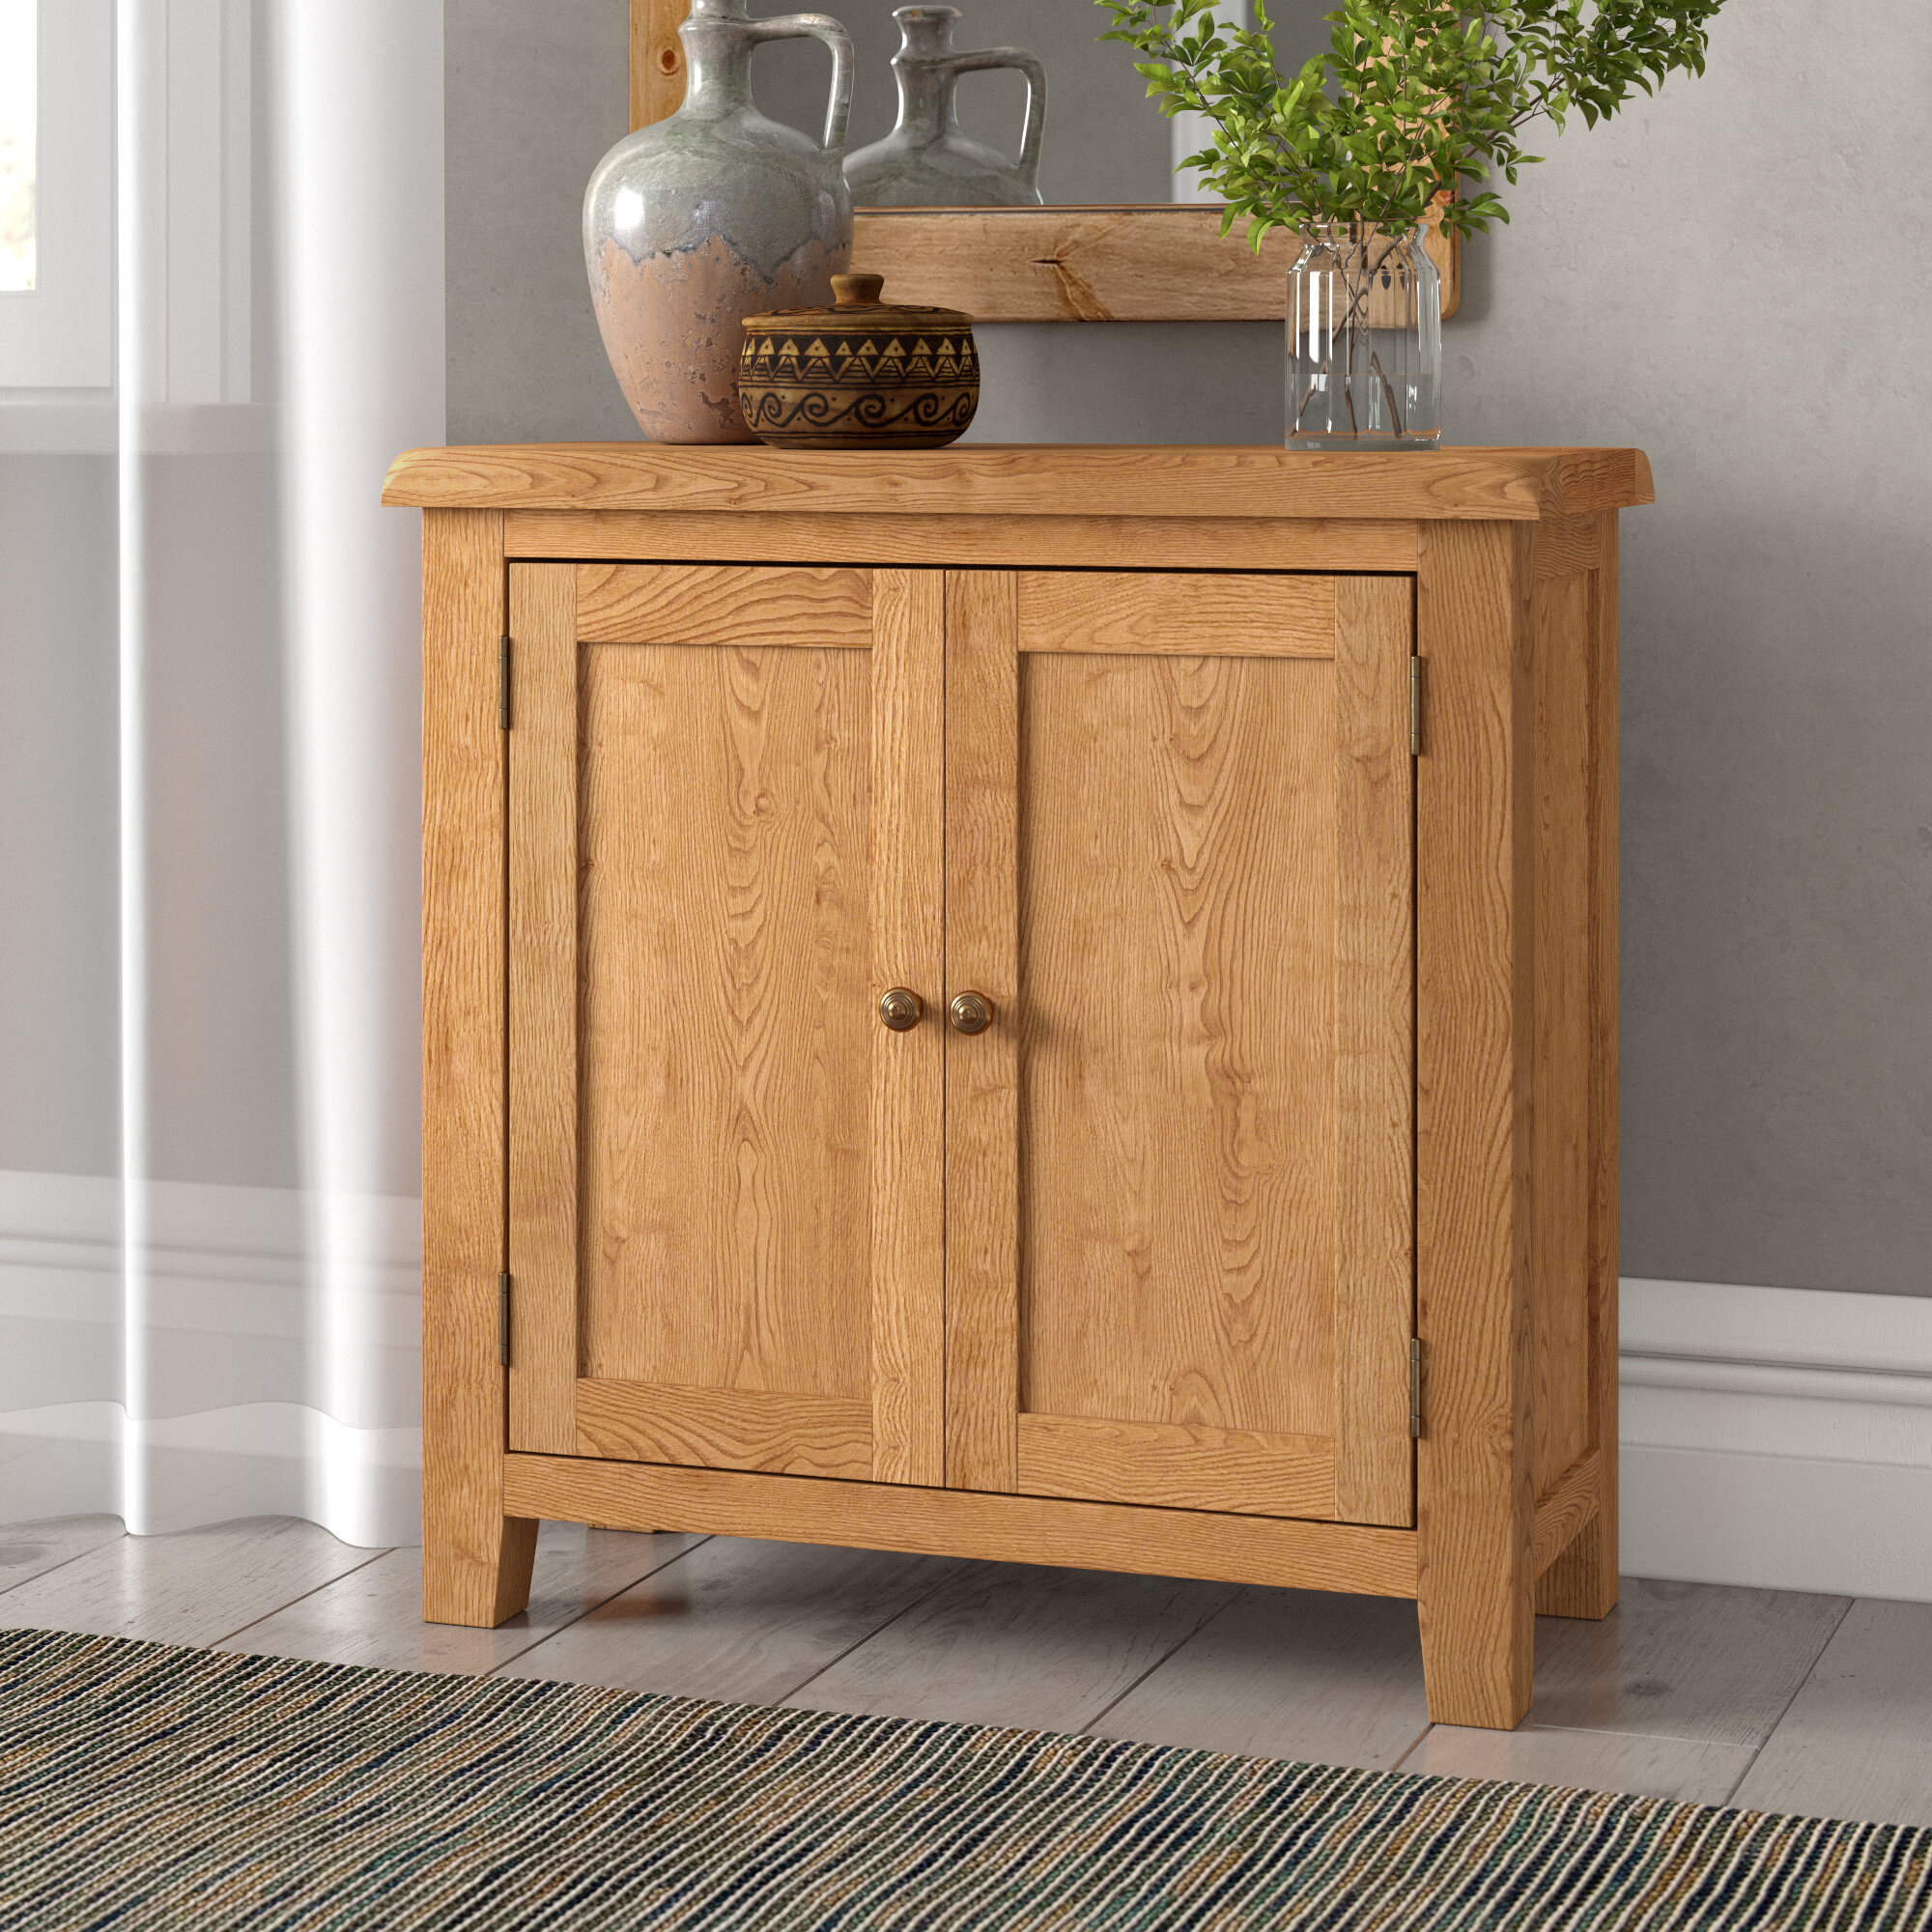 hazelwood home rothbury 2 doors small cabinet reviews wayfair co uk rh wayfair co uk